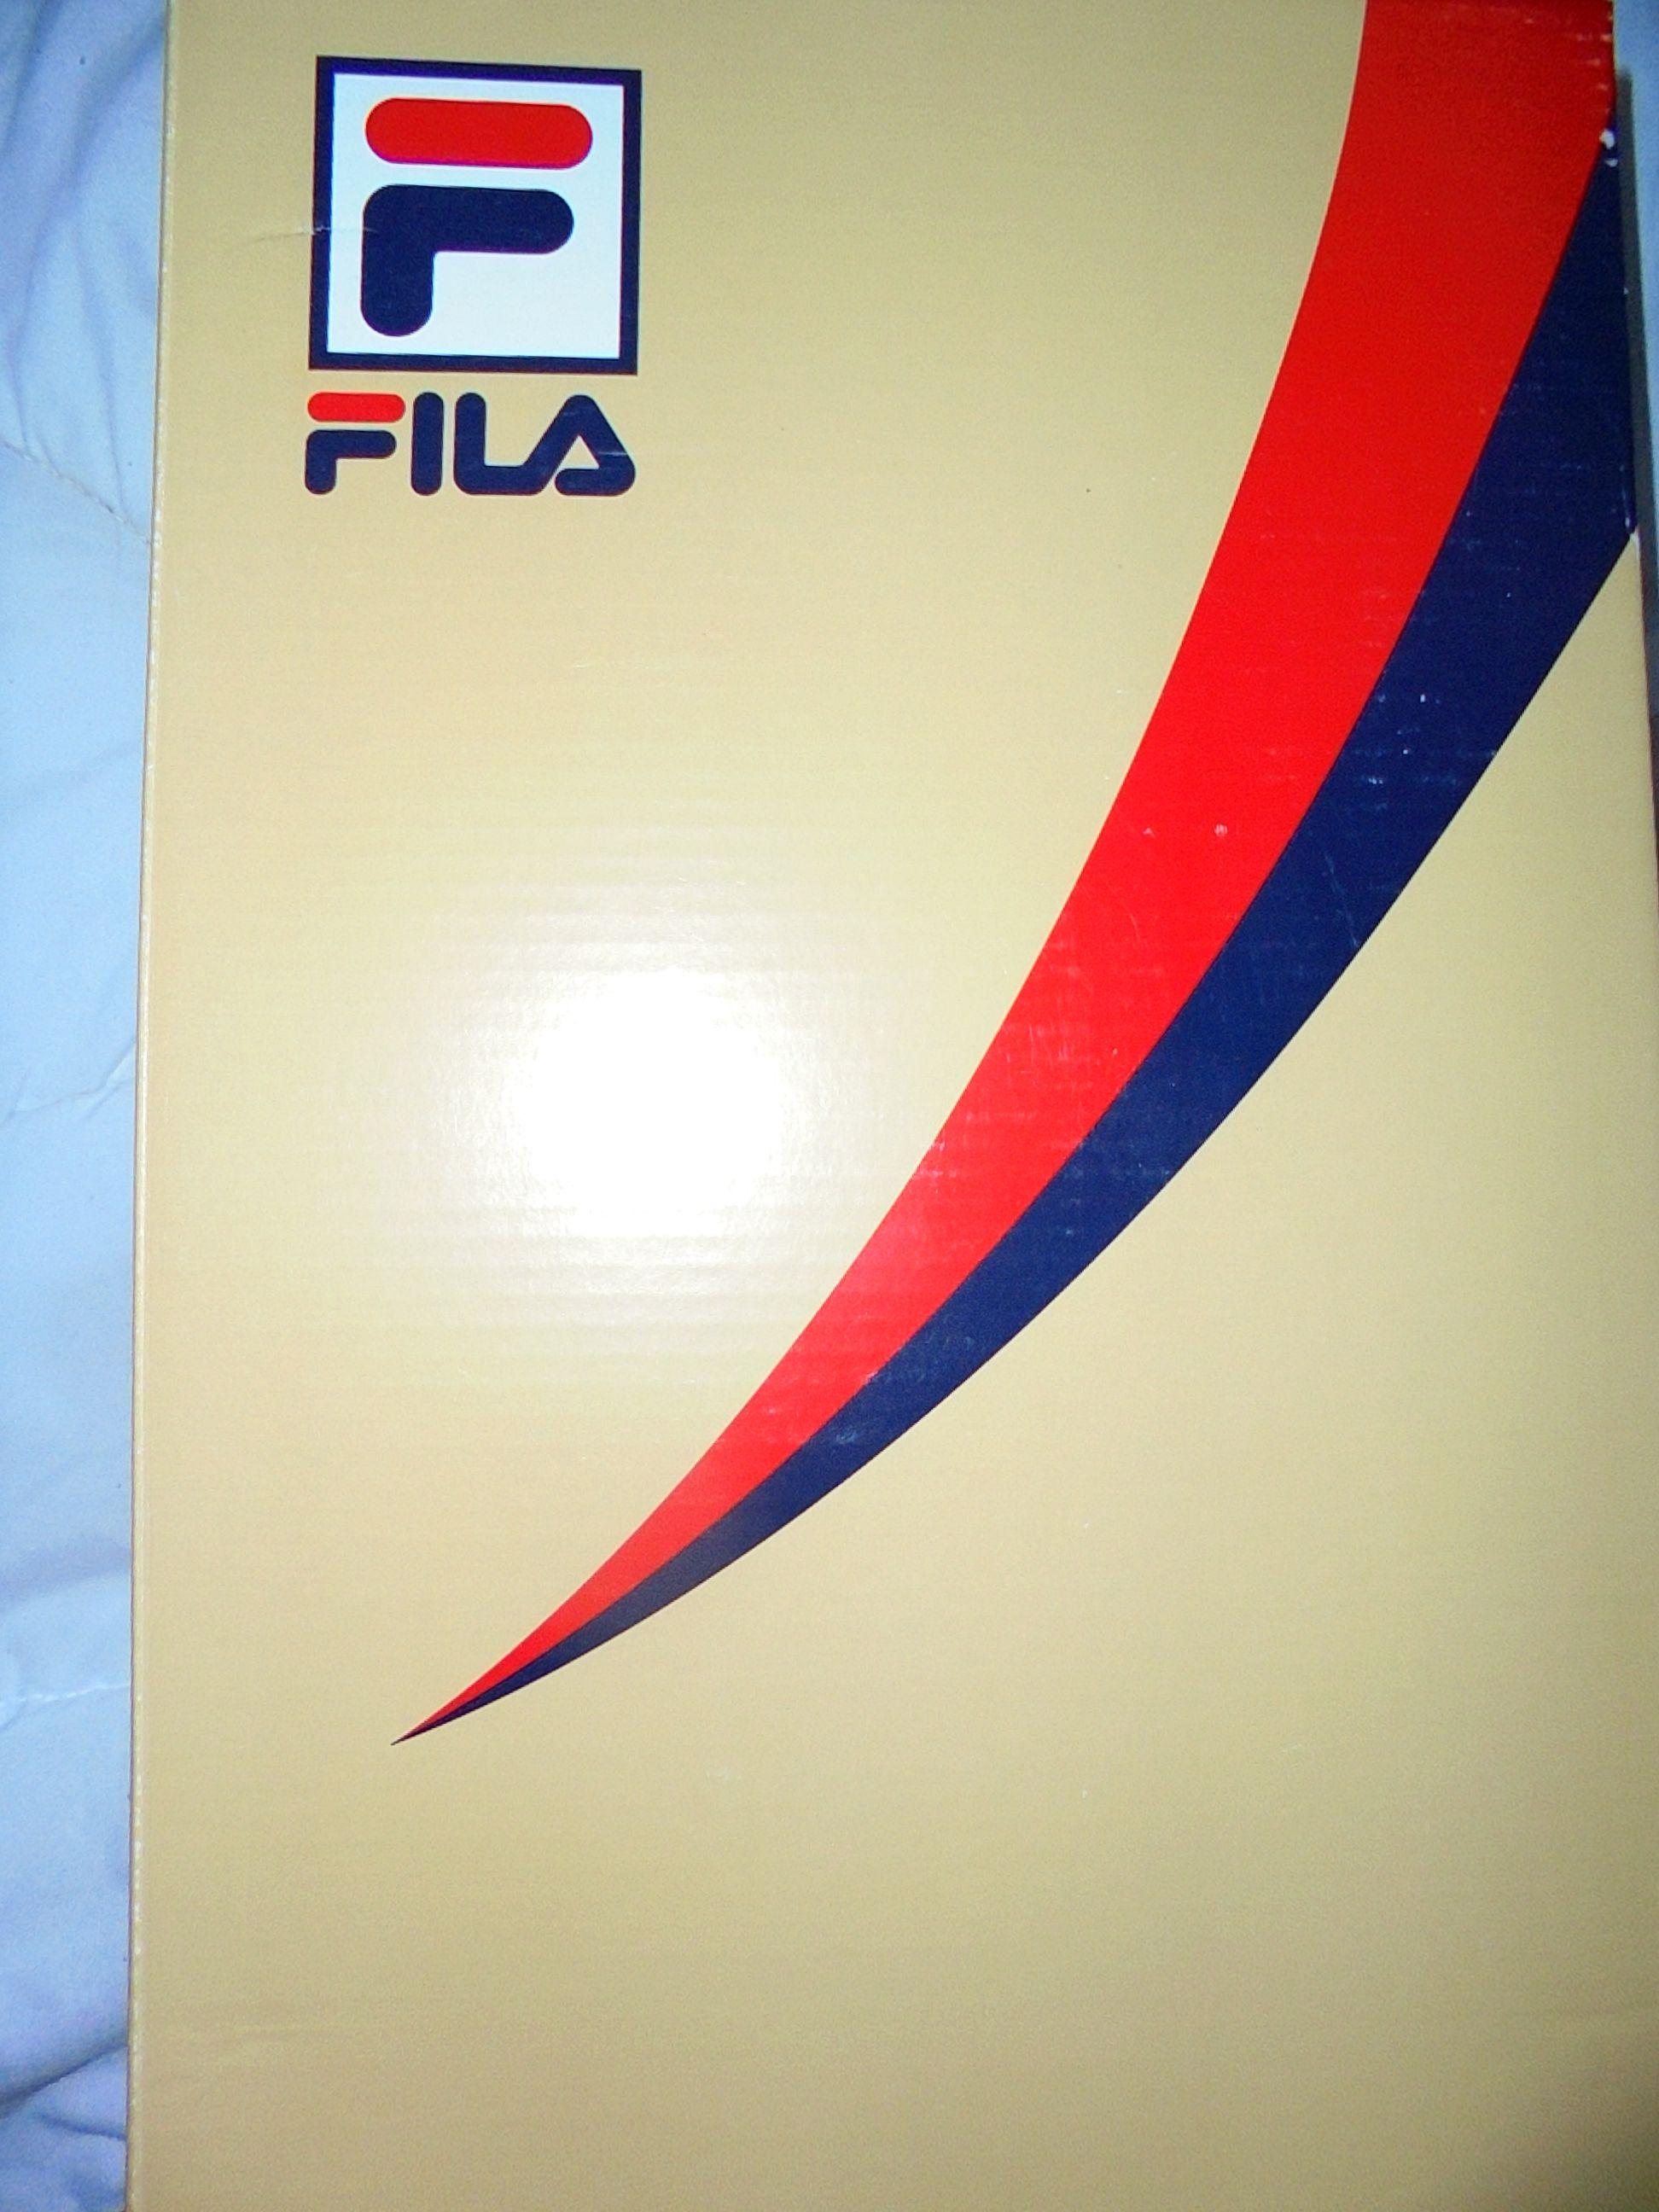 #FilaClassic